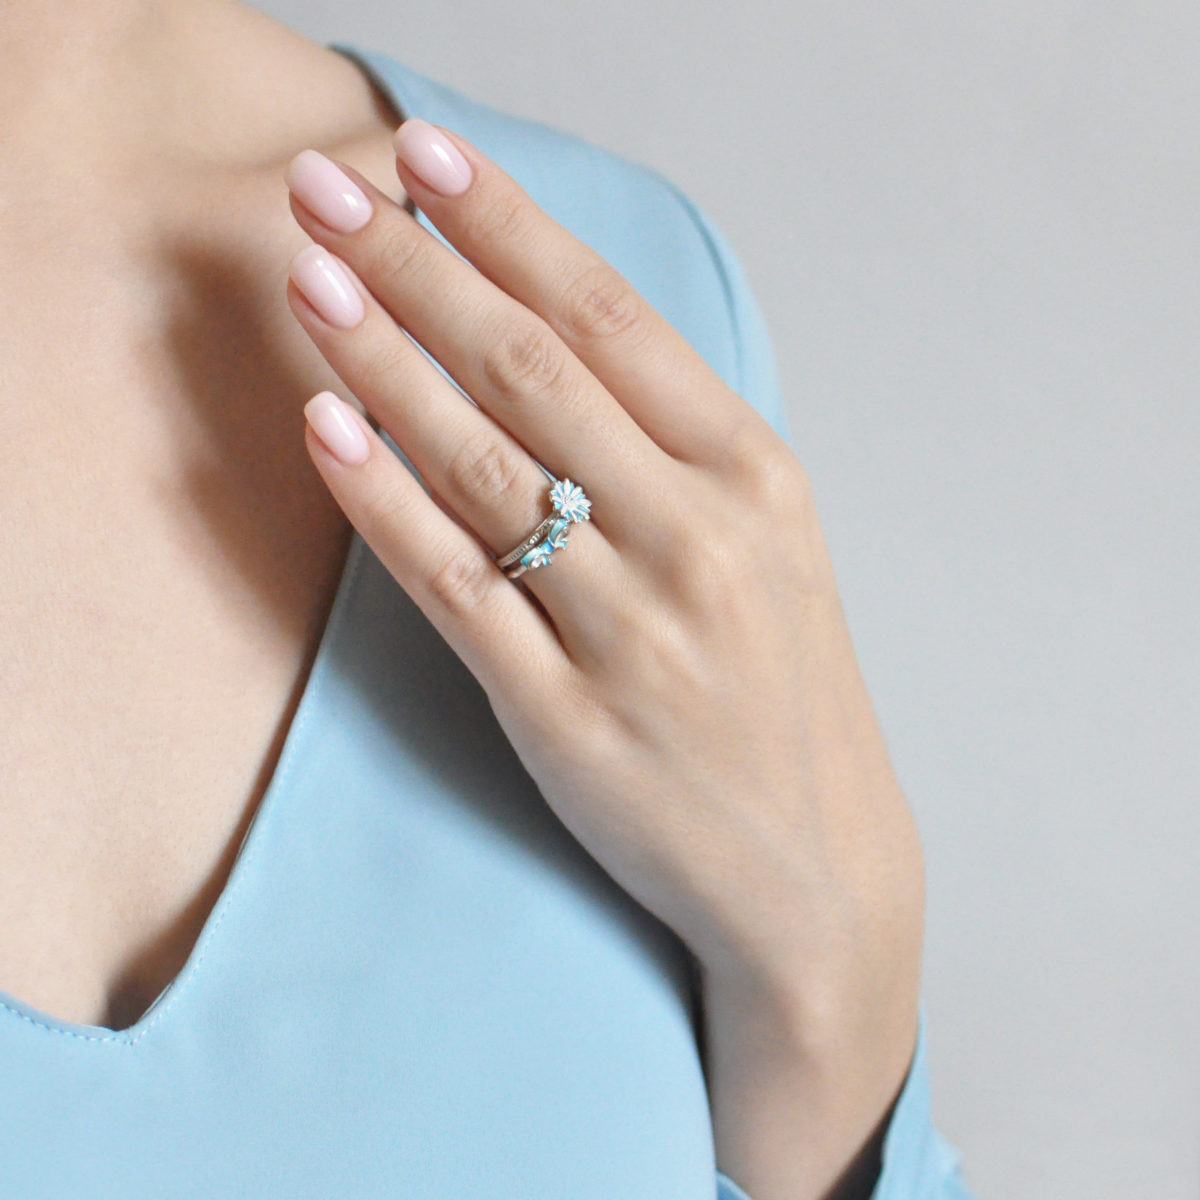 61.206 golubaya 61.201 golubaya 1200x1200 - Кольцо из серебра «Ромашка», голубое